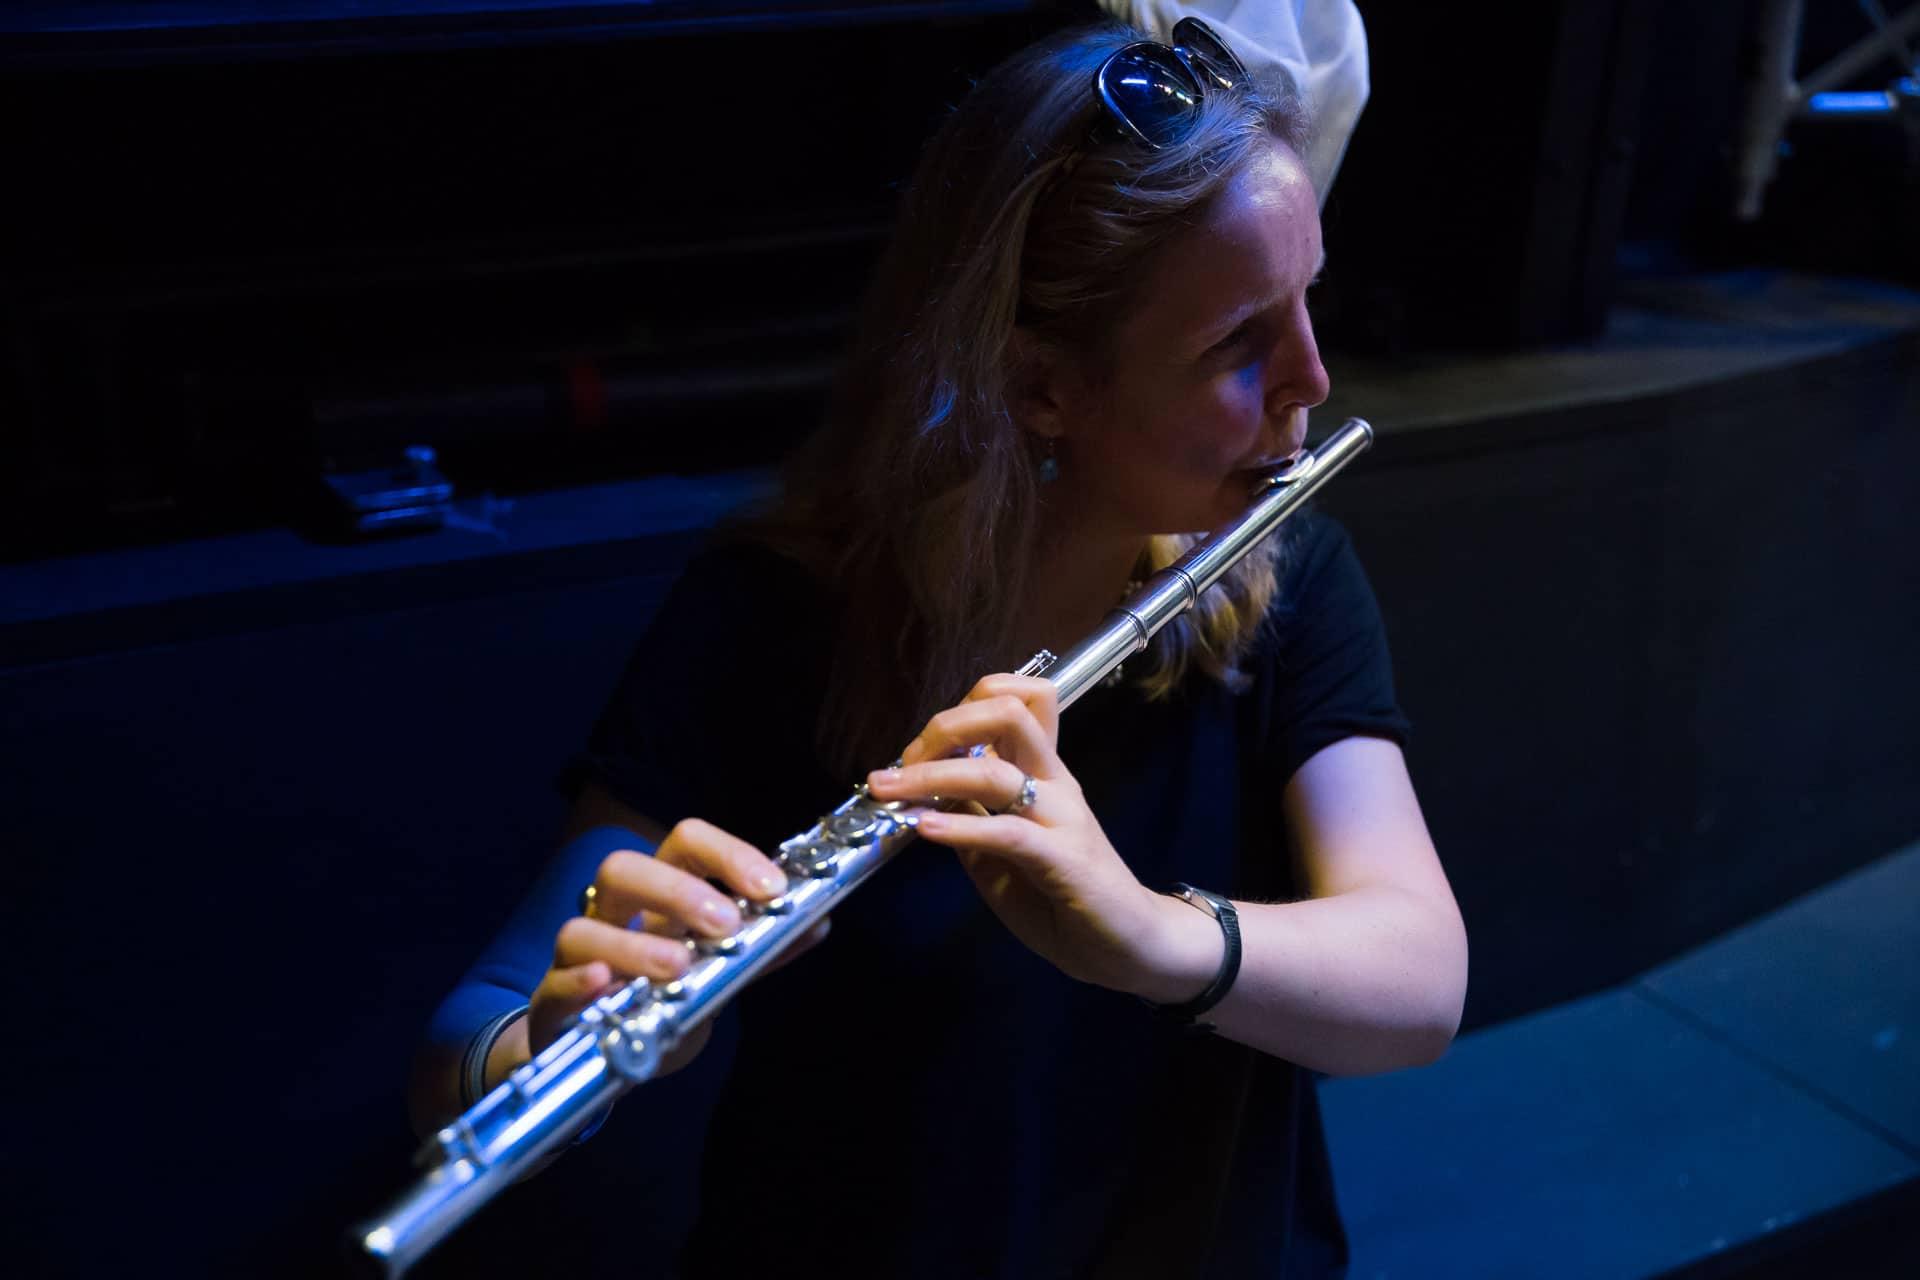 Lorna McGhee 8/29/17 PSO 2017 European Tour ©Todd Rosenberg 2017